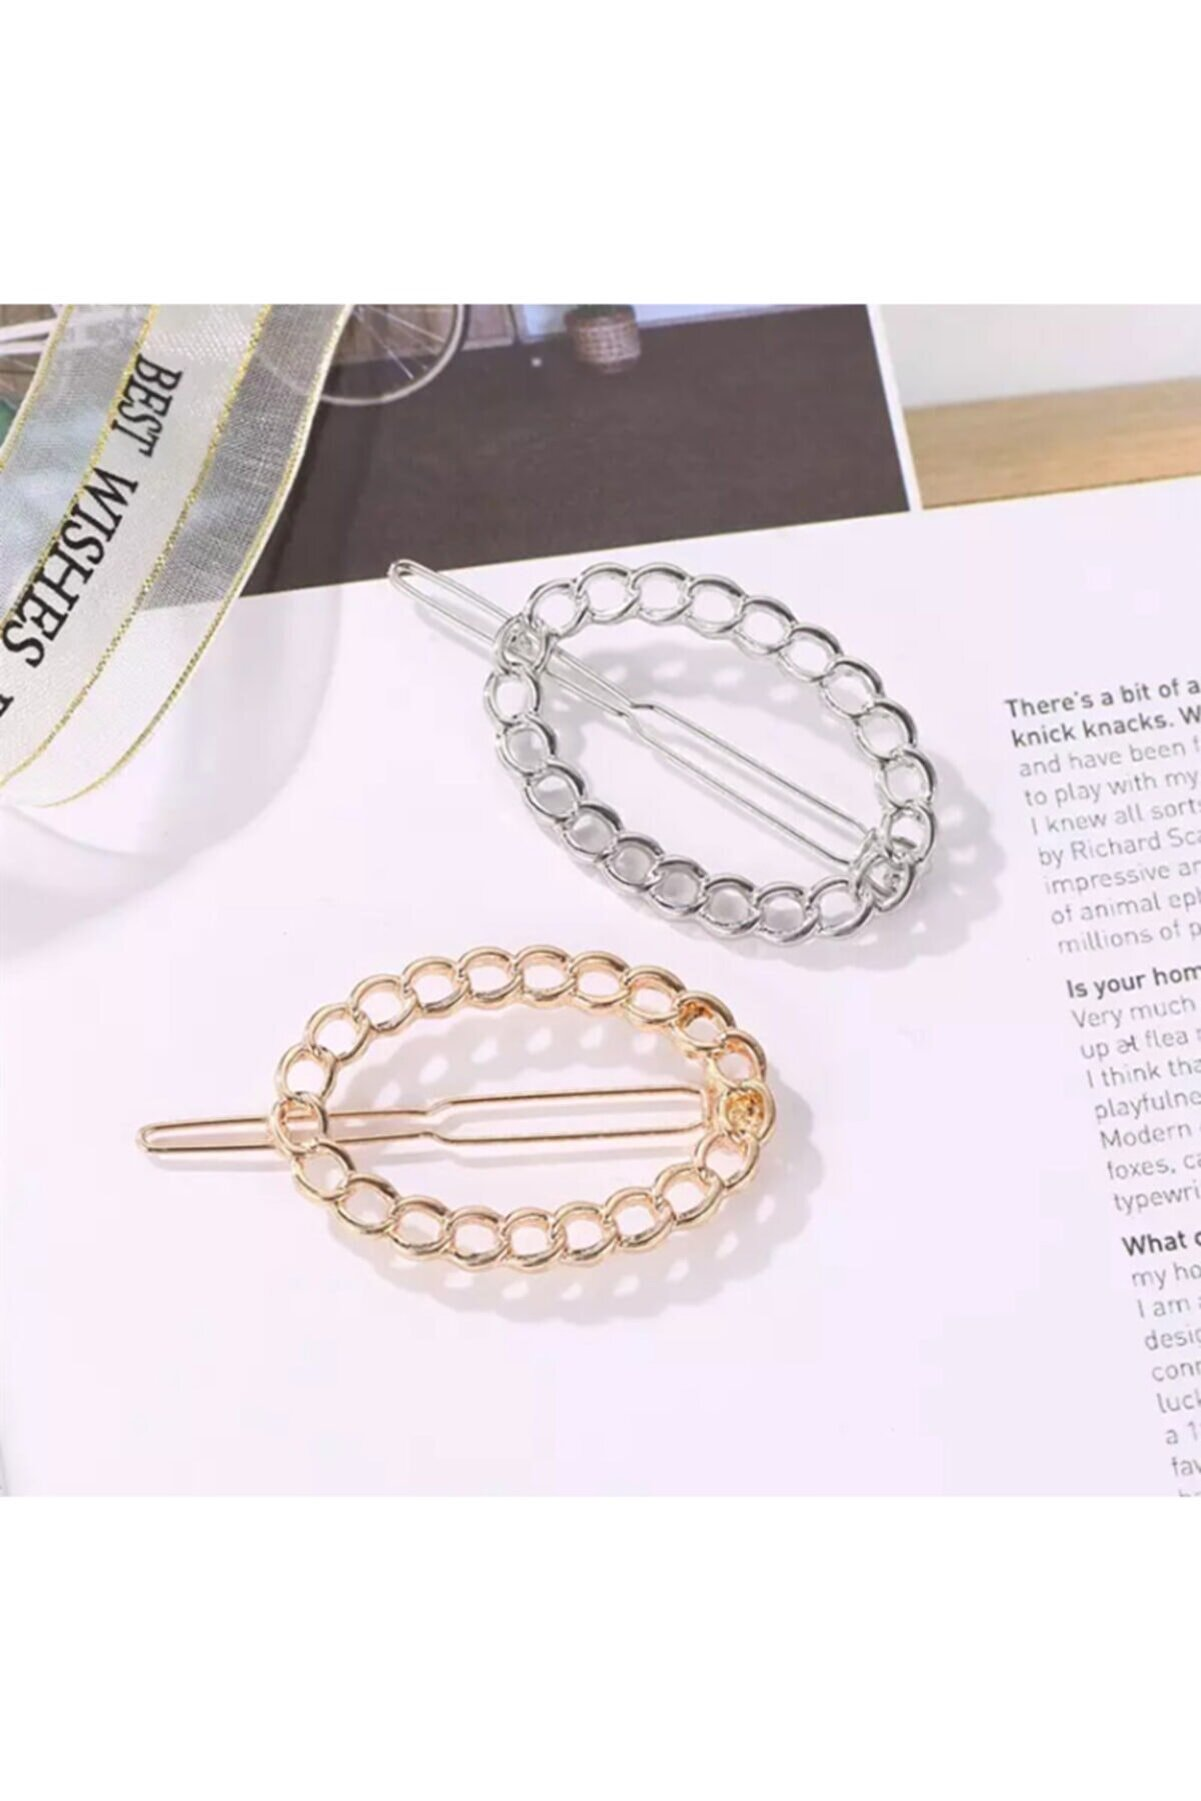 Mingy 2 Adet Klipsli Zincir Elips Tasarım Saç Tokası, 2'li Metal Toka Seti Gümüş/gold